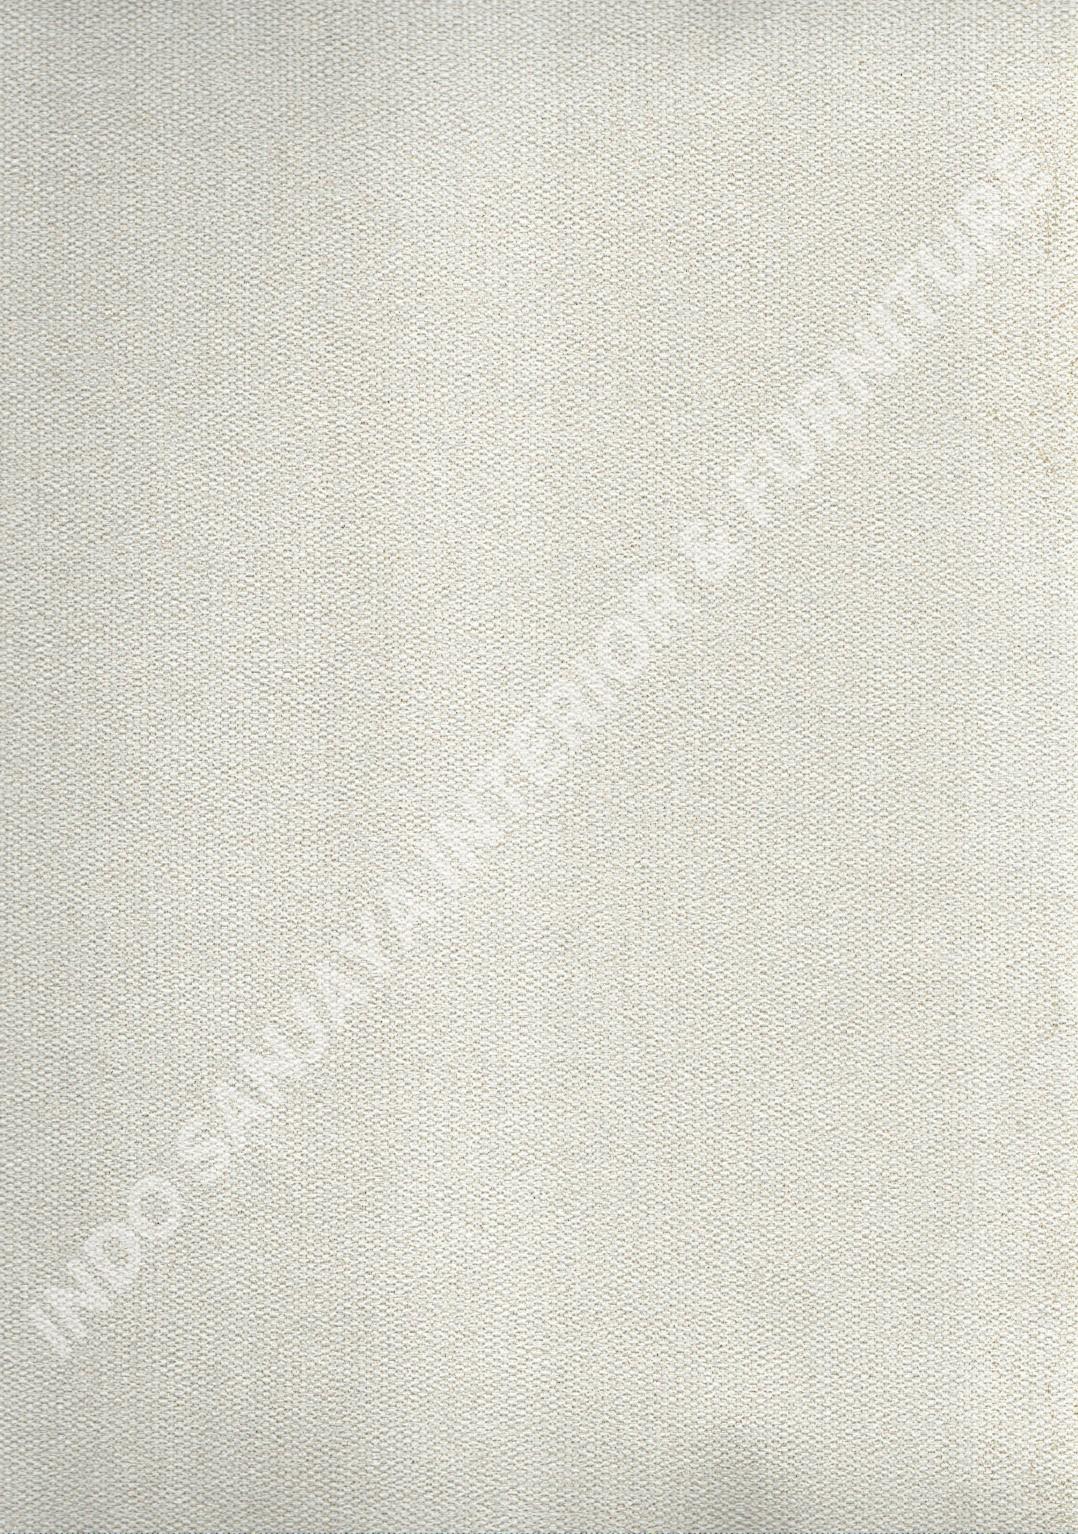 wallpaper   Wallpaper Minimalis Polos 87033:87033 corak  warna